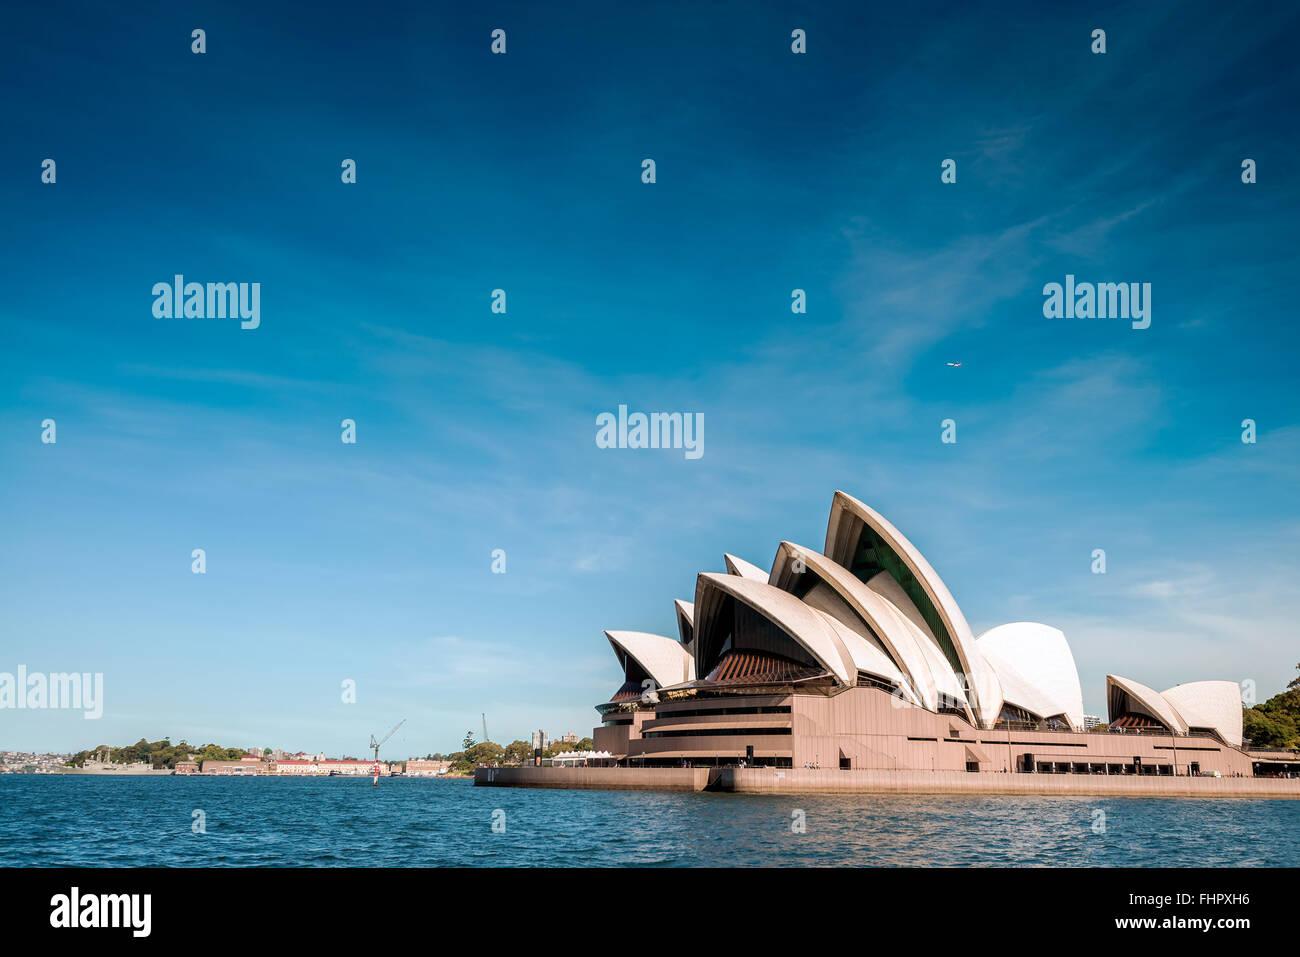 Sydney, Australien - 9. November 2015: The Sydney Opera House ist ein Multi-Veranstaltungsort Performing Arts Center Stockfoto